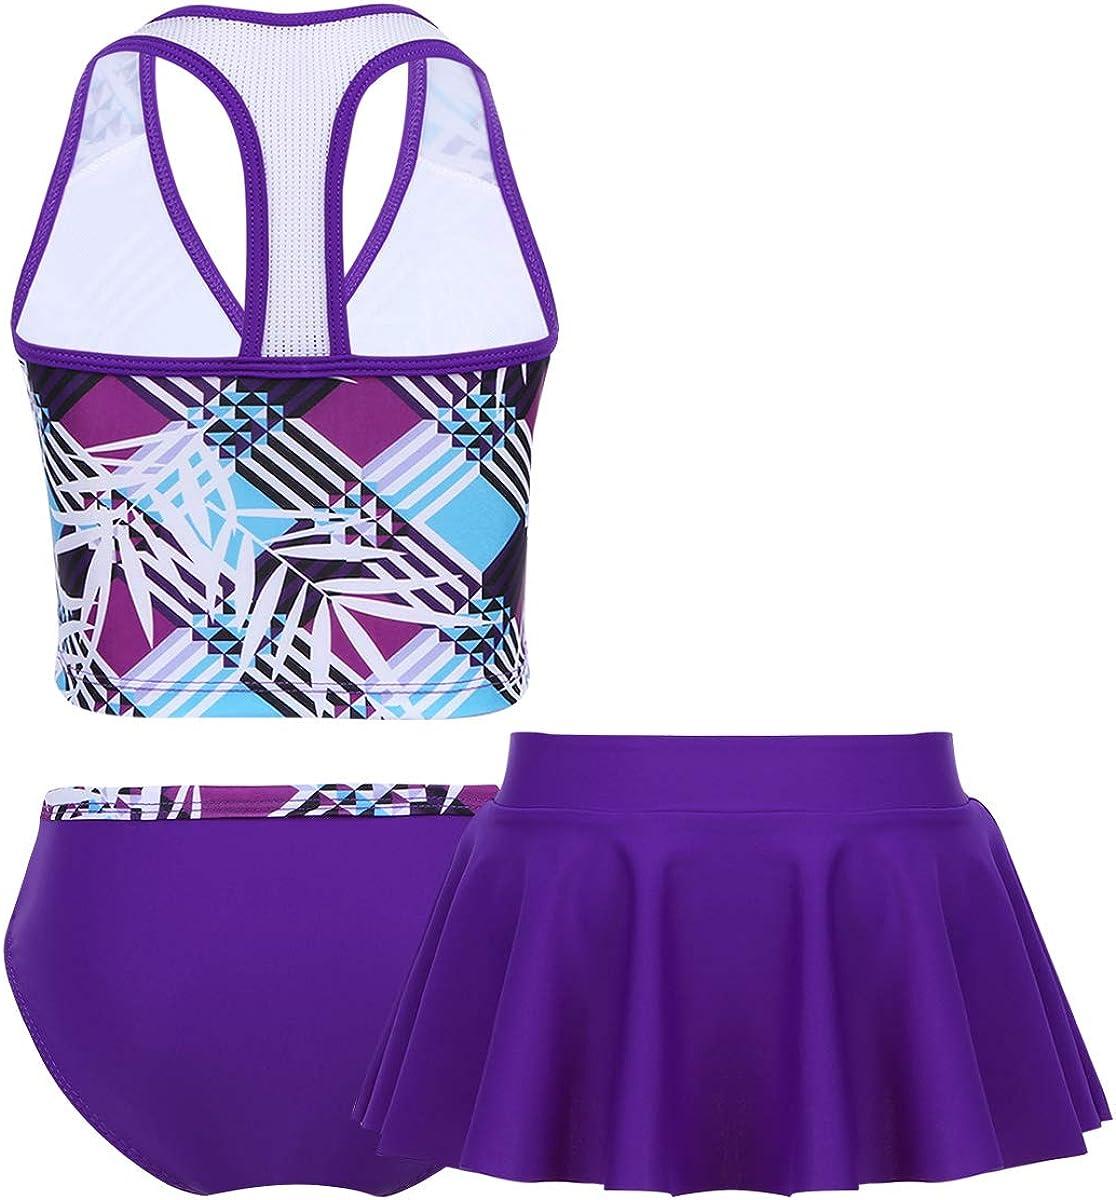 Alvivi Kids Girls 3PCS Tankini Sets Summer Beachwear Swimwear Bathing Suit with Pleated Skirt